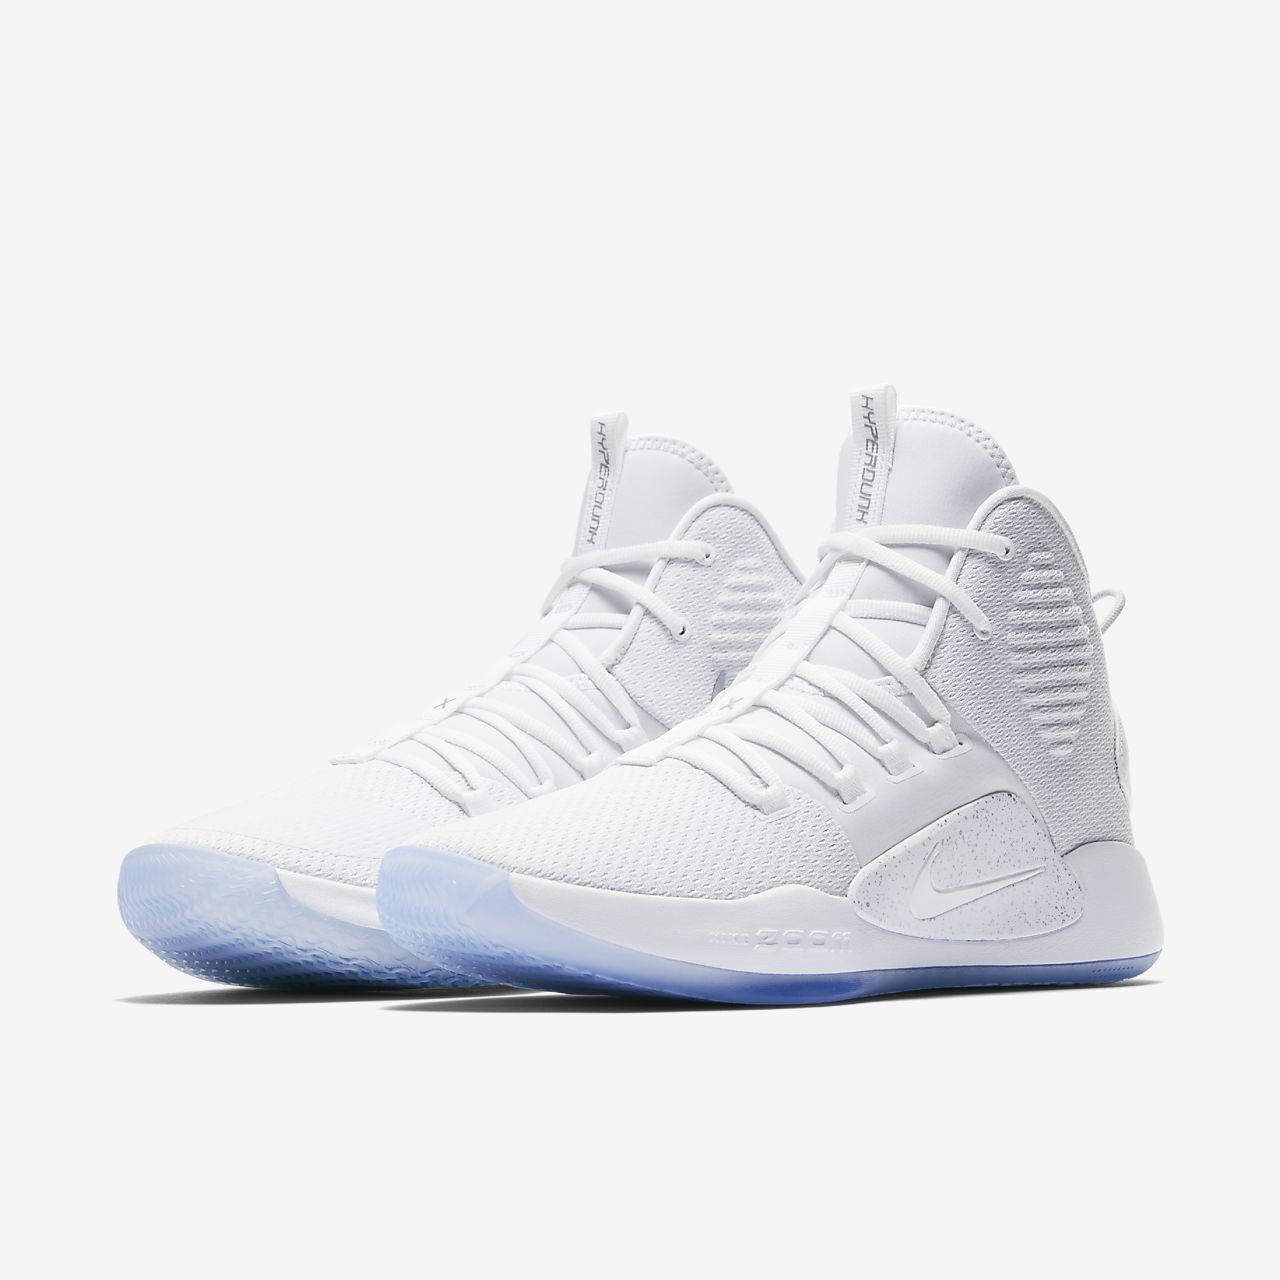 684c0f8d30d Nike Hyperdunk X Basketball Shoe. Nike.com GB